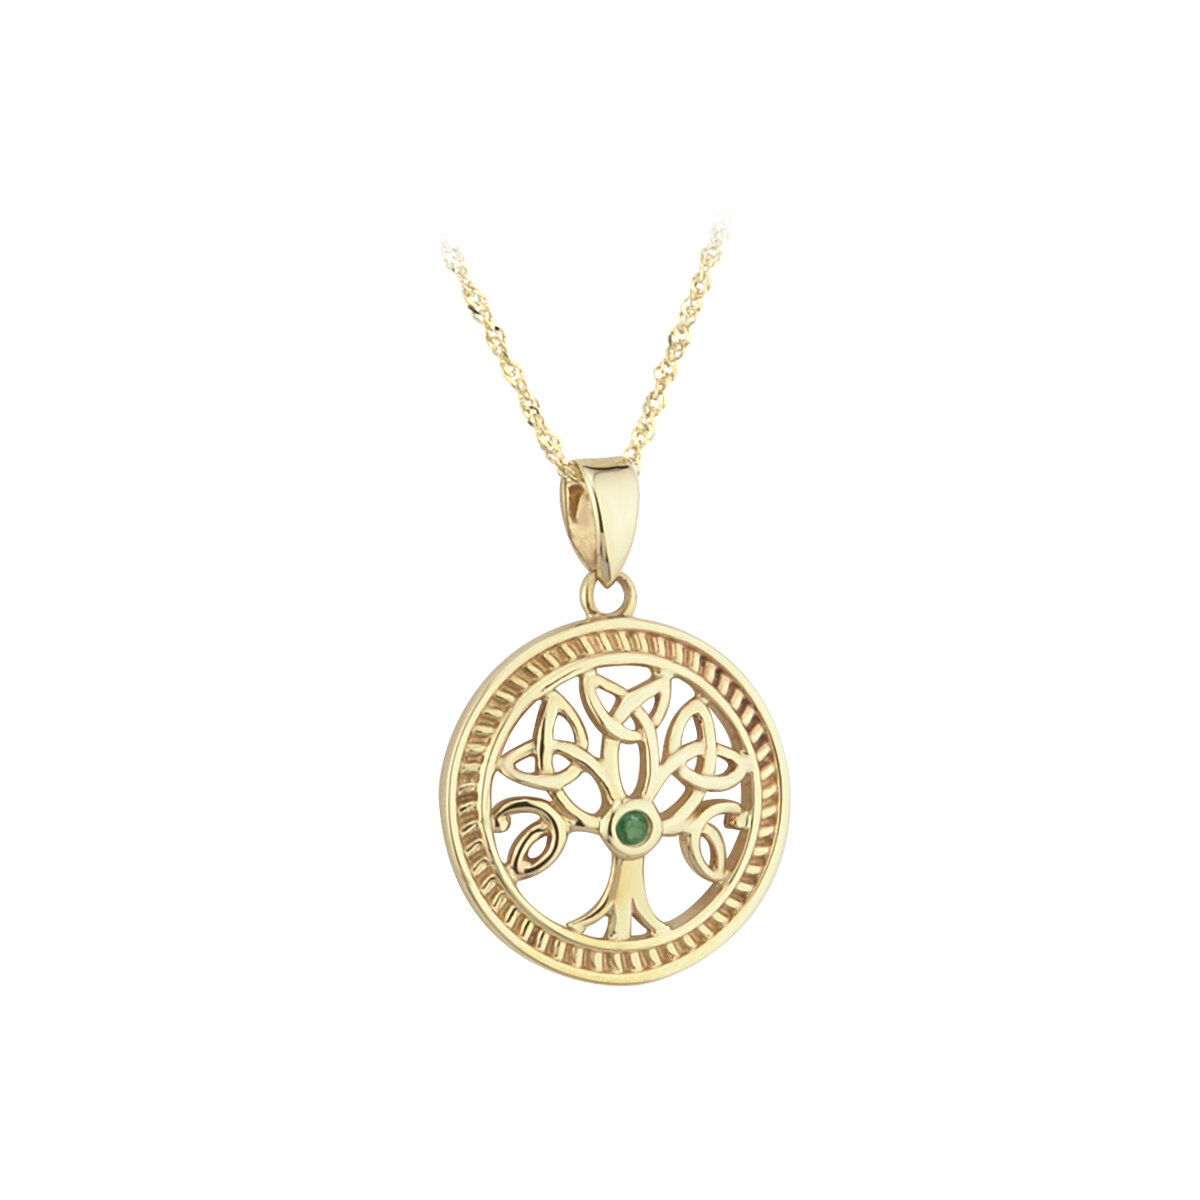 10k gold emerald tree of life pendant s45143 from Solvar